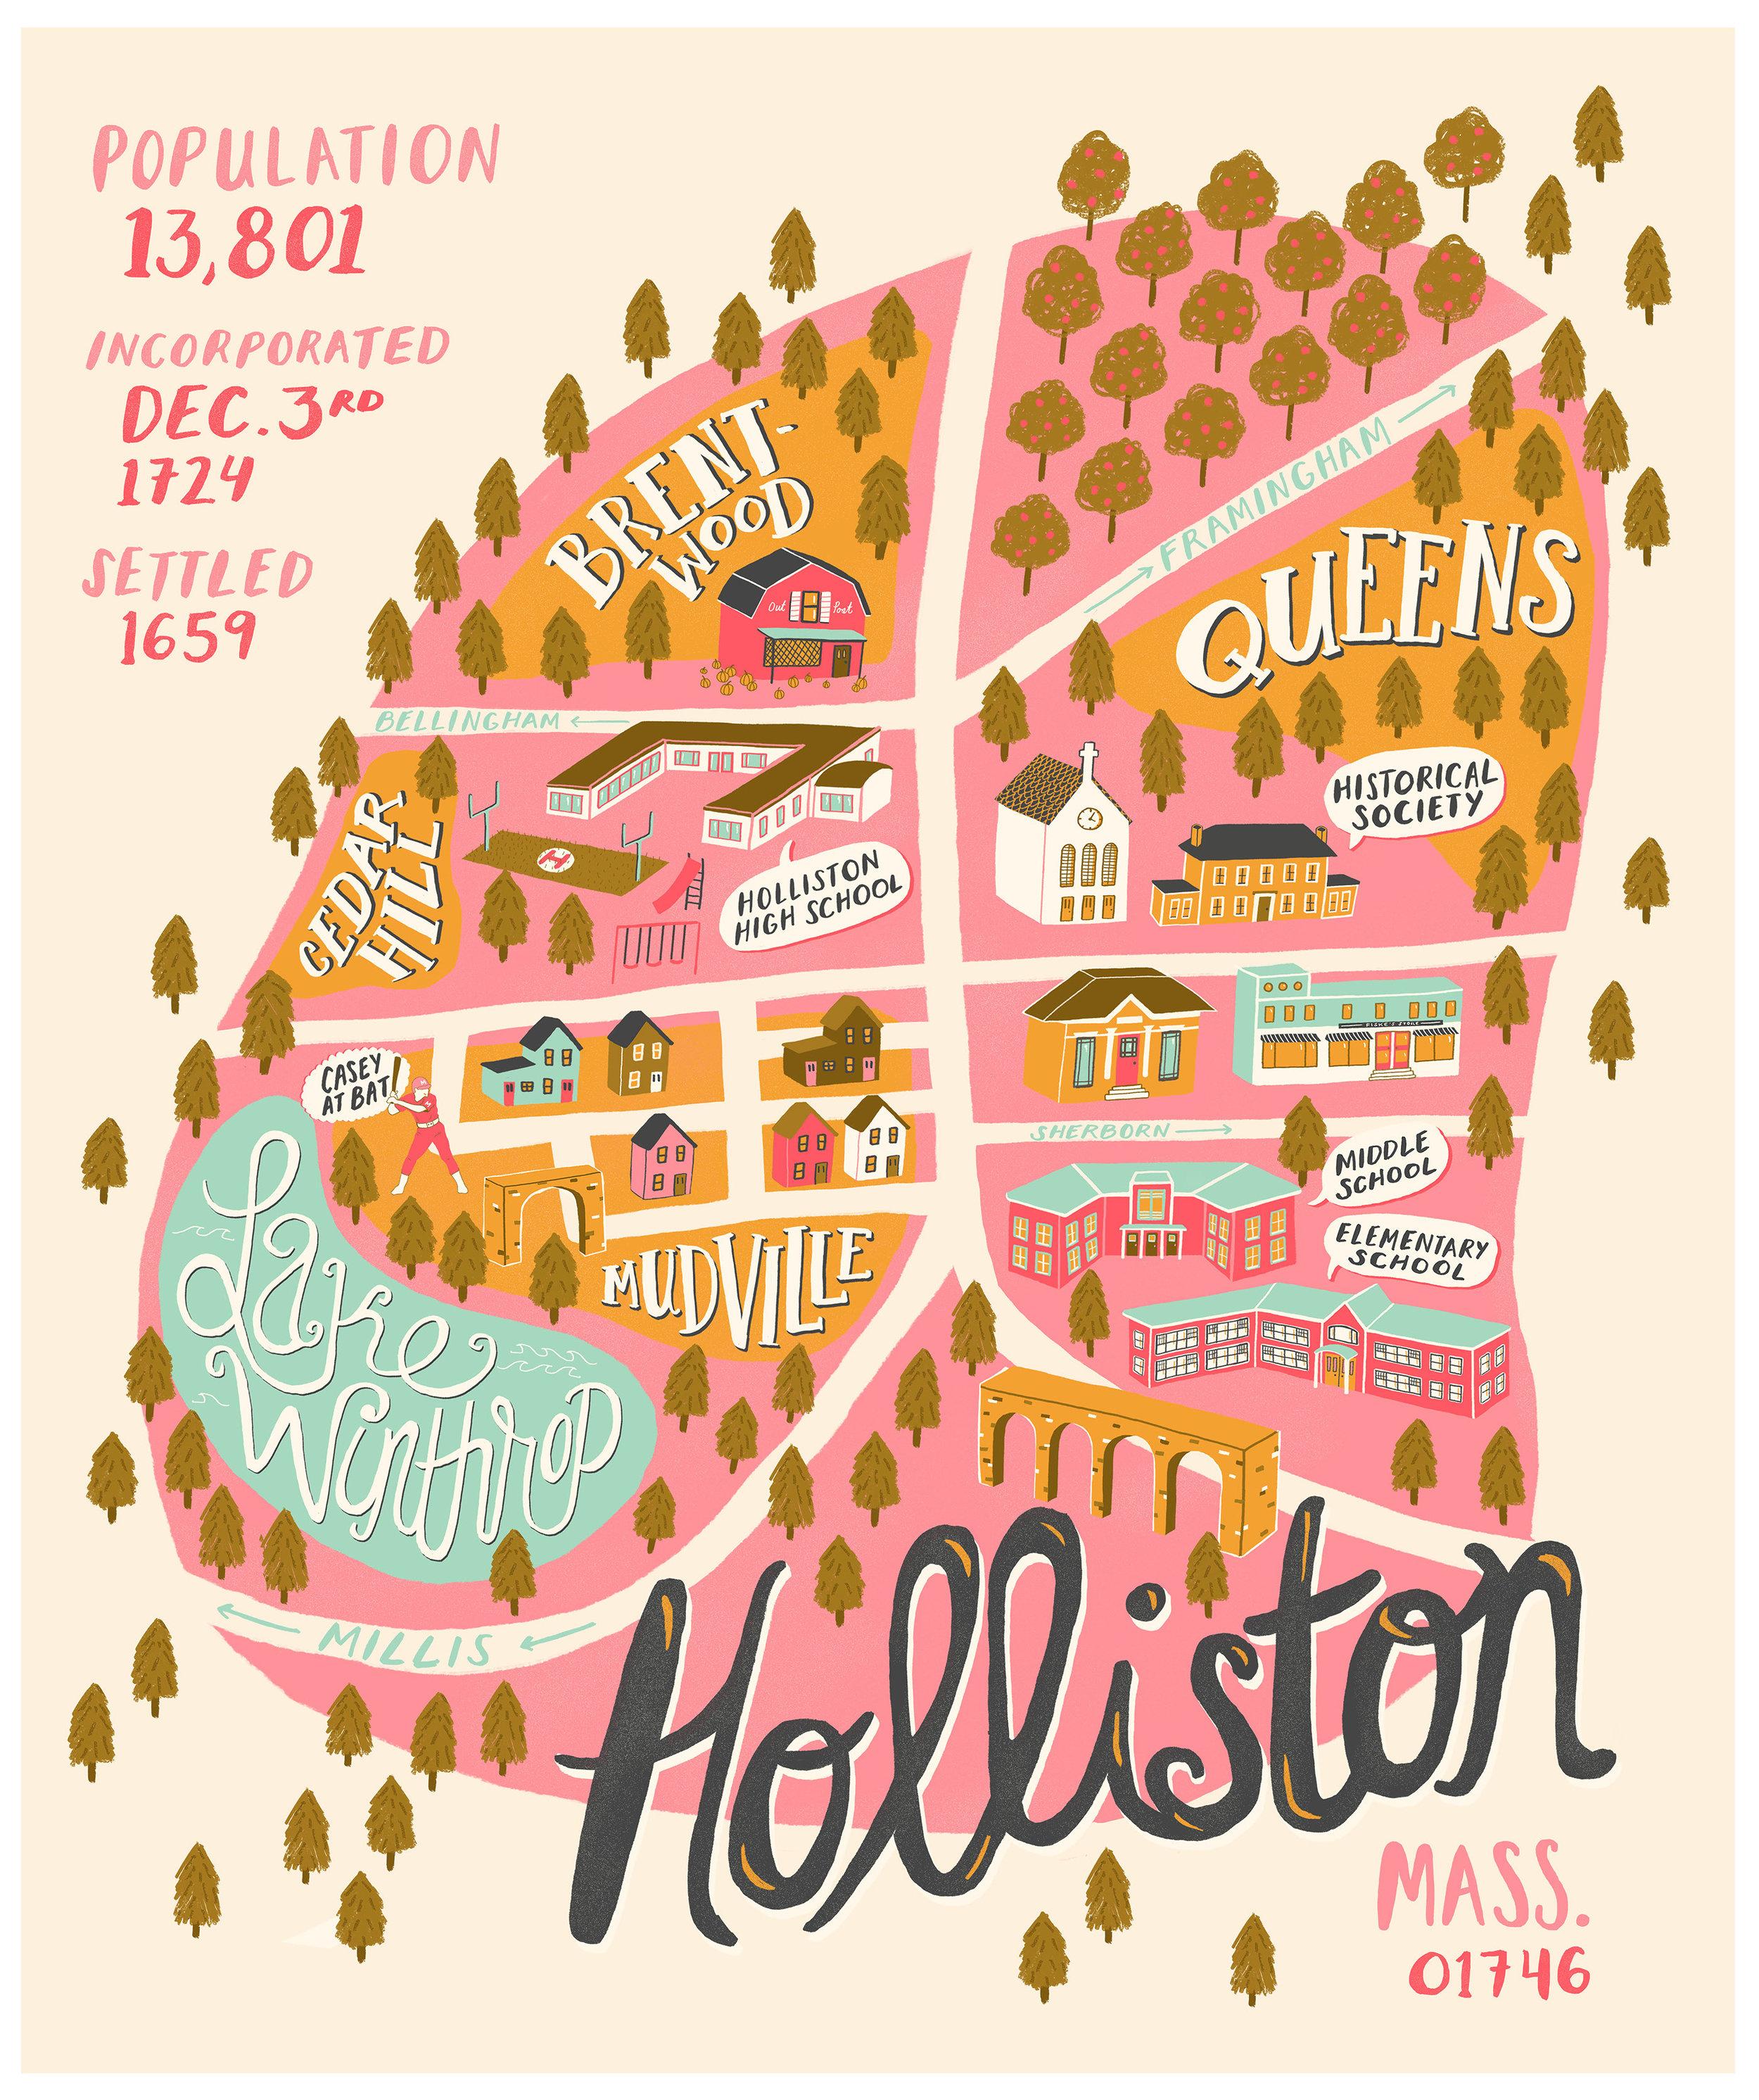 HollistonMap.jpg